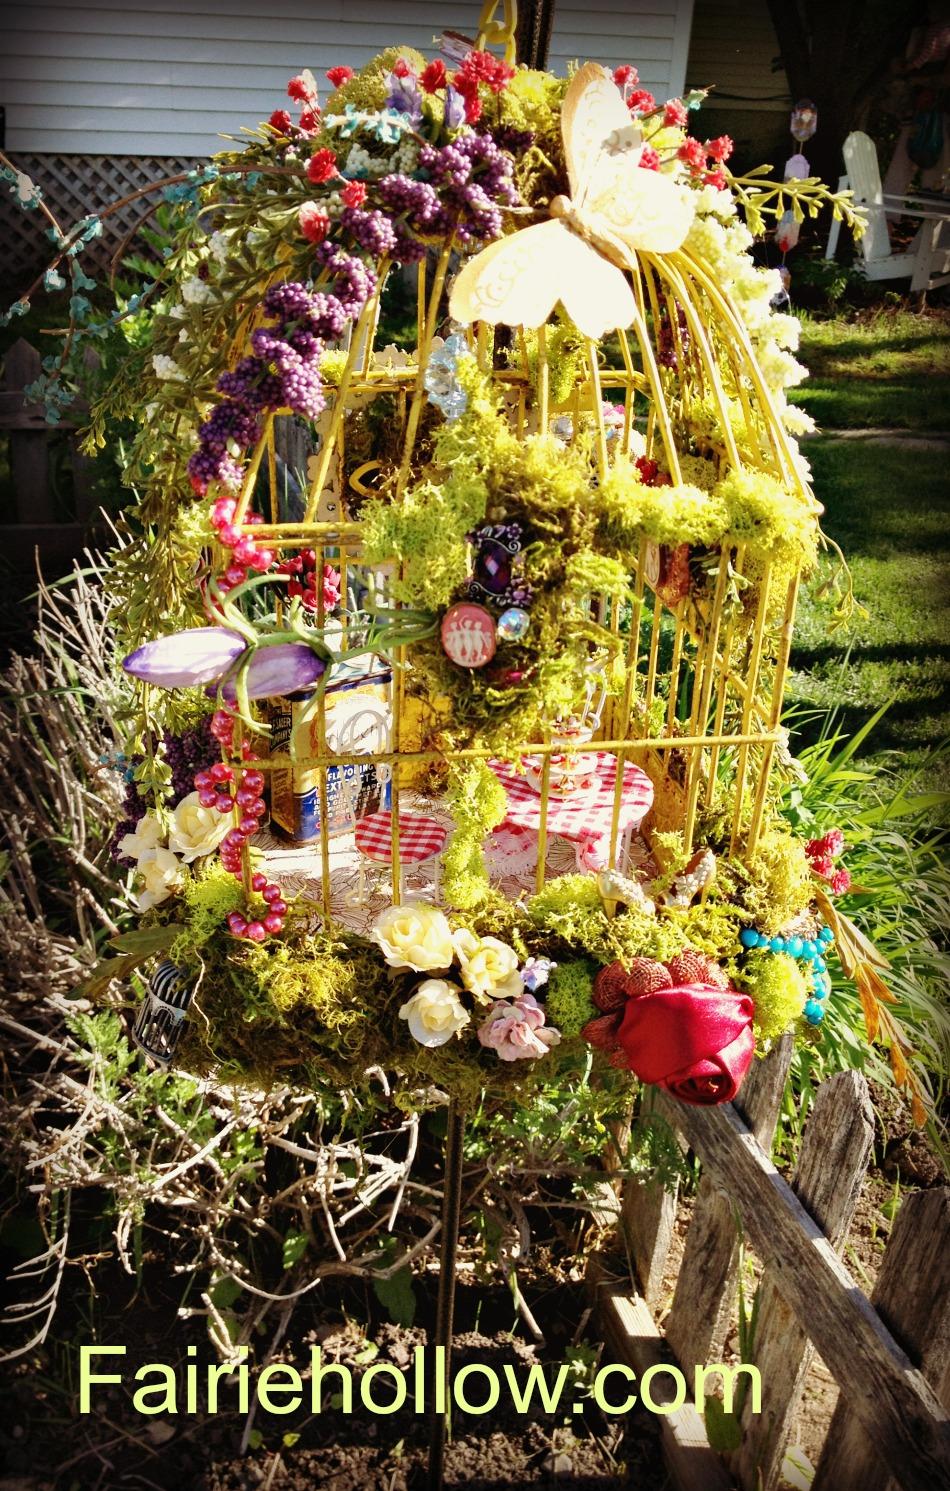 Garden Fairie party house birdcage flowers moss flowers fairy furniture |fairiehollow.com